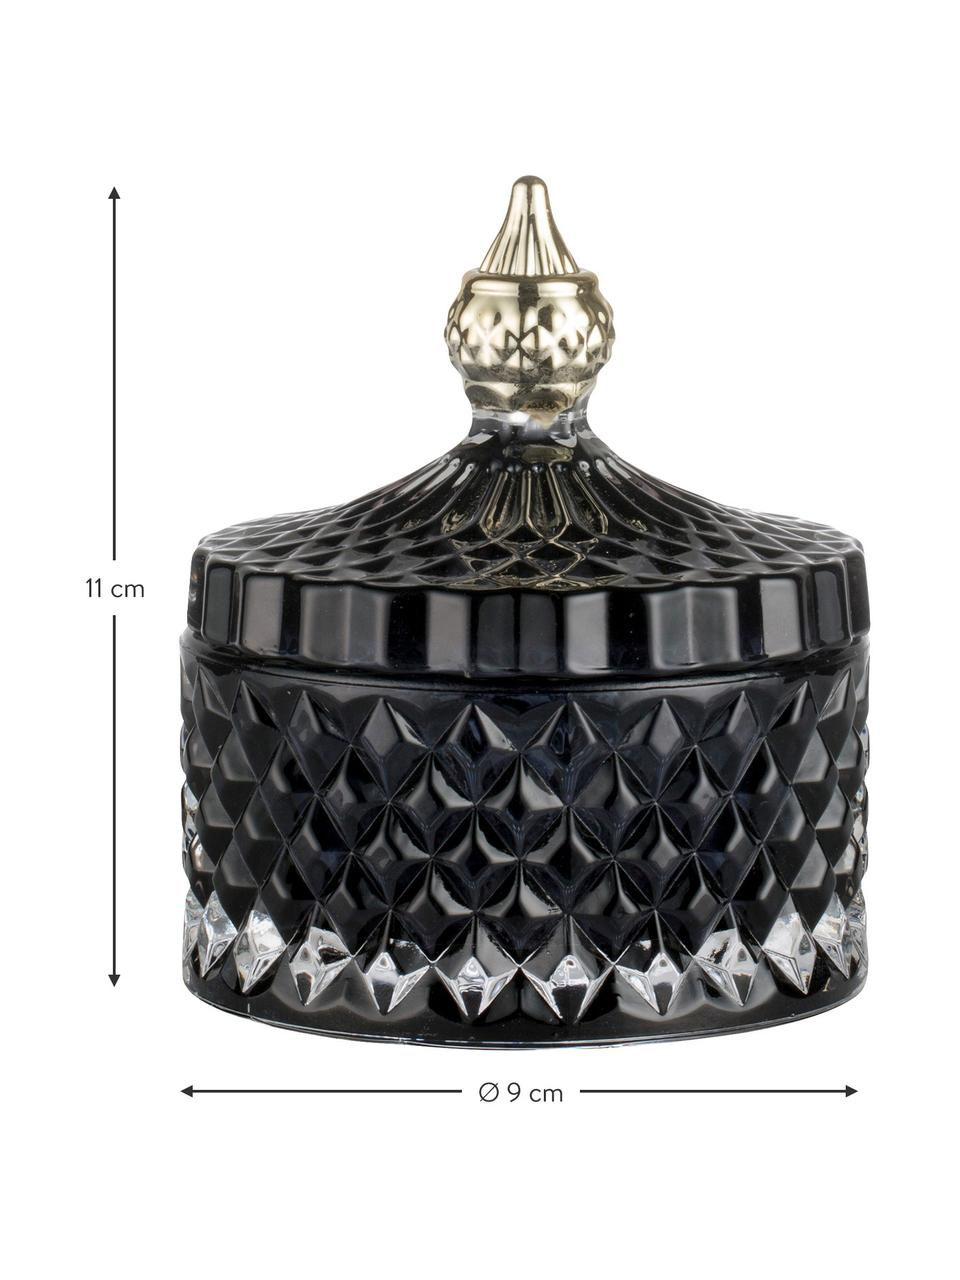 Opbergpot Miya, Glas, Zwart, goudkleurig, Ø 9 x H 11 cm